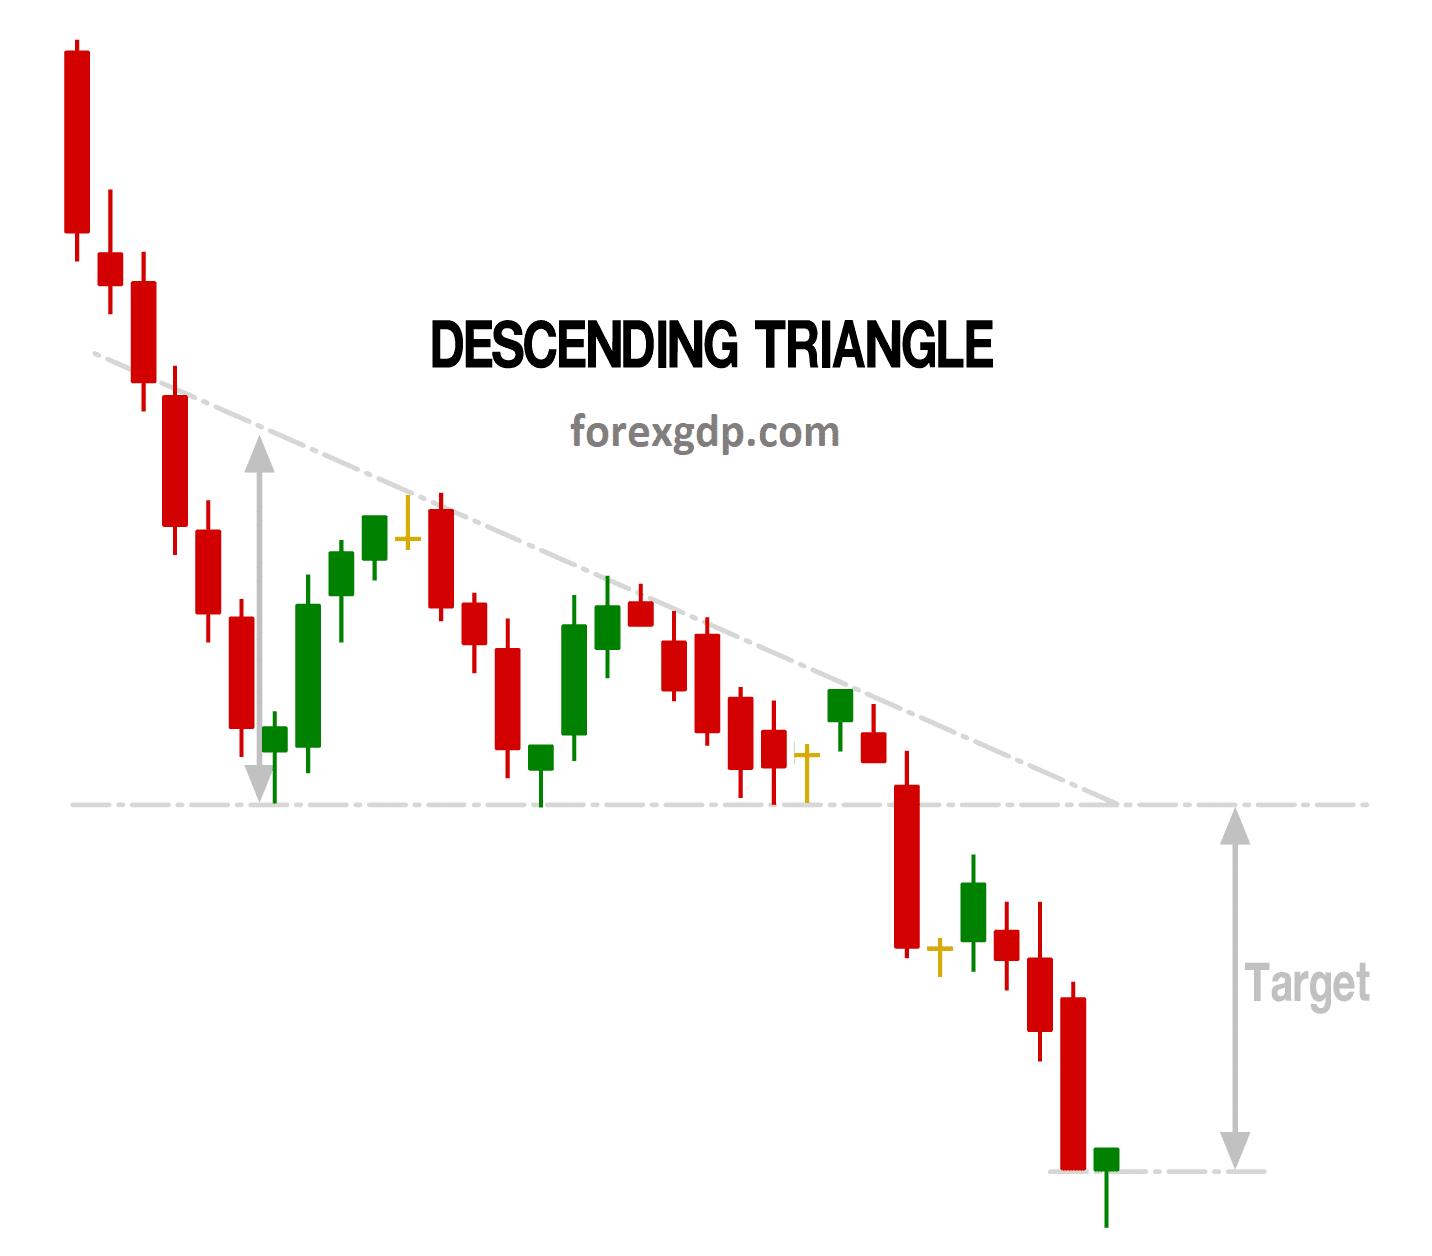 Descending Triangle take profit target price